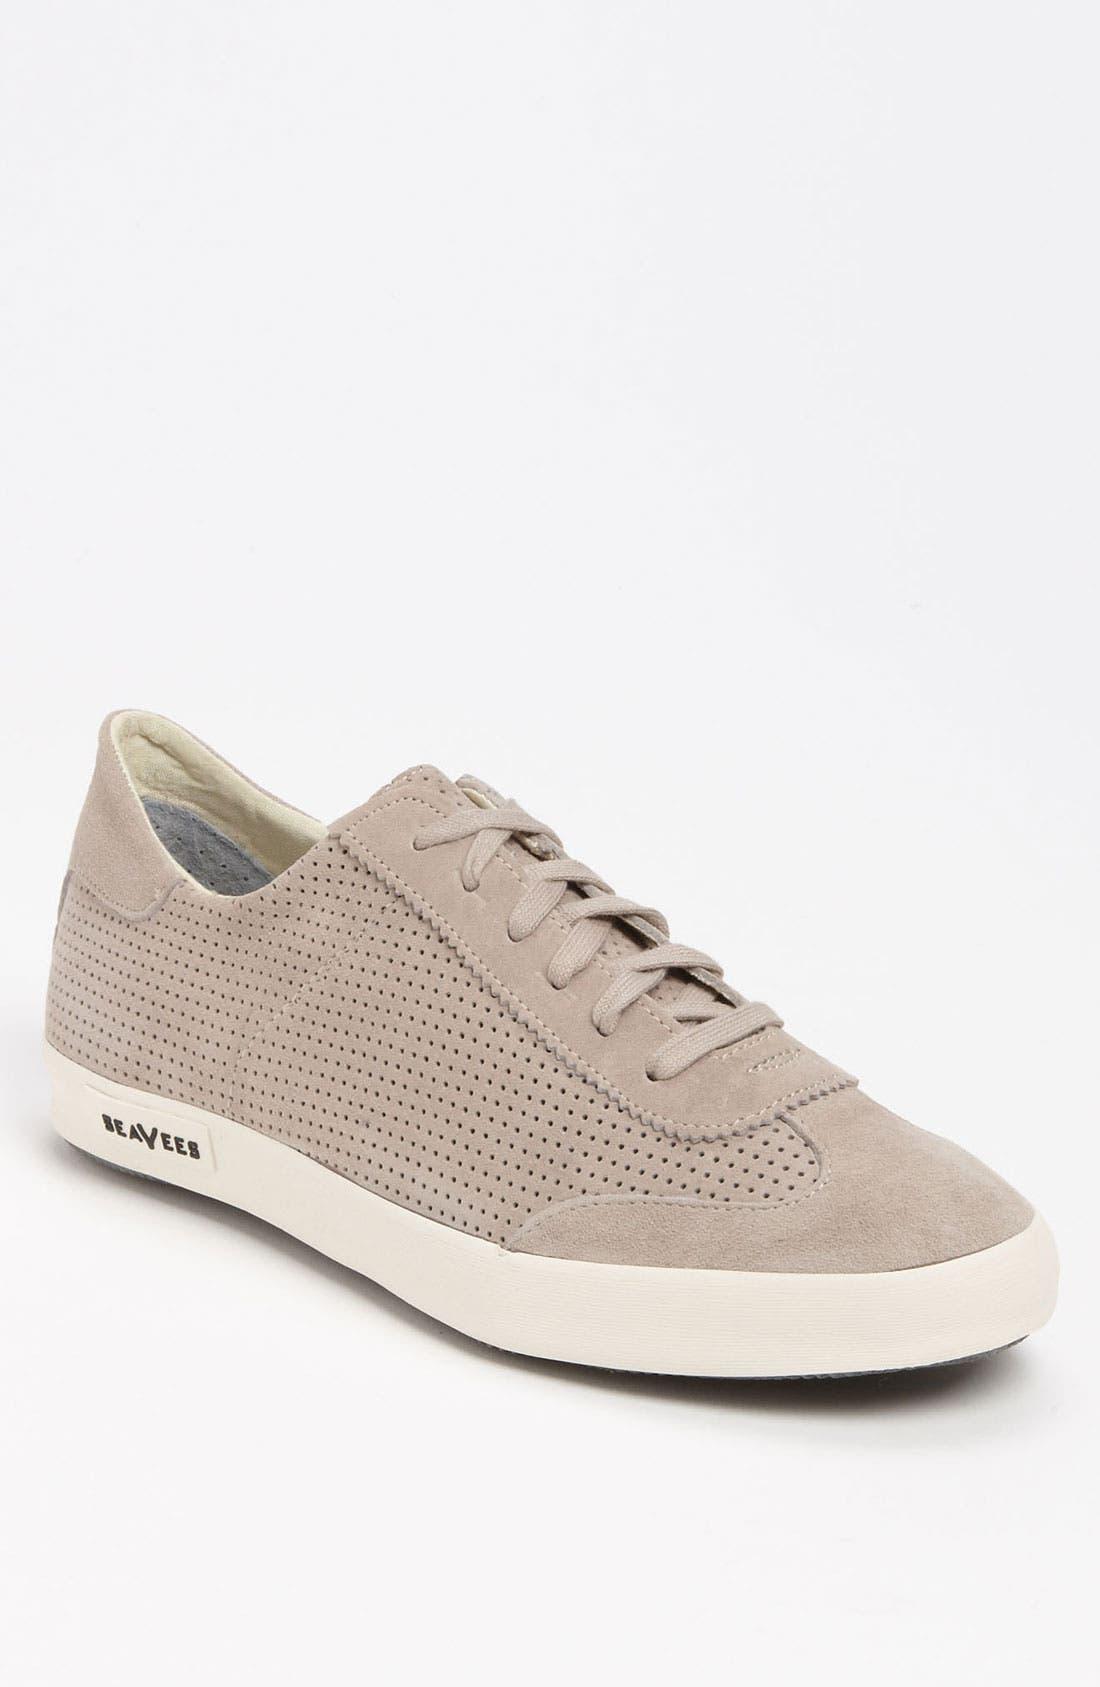 Main Image - SeaVees Perforated Court Shoe